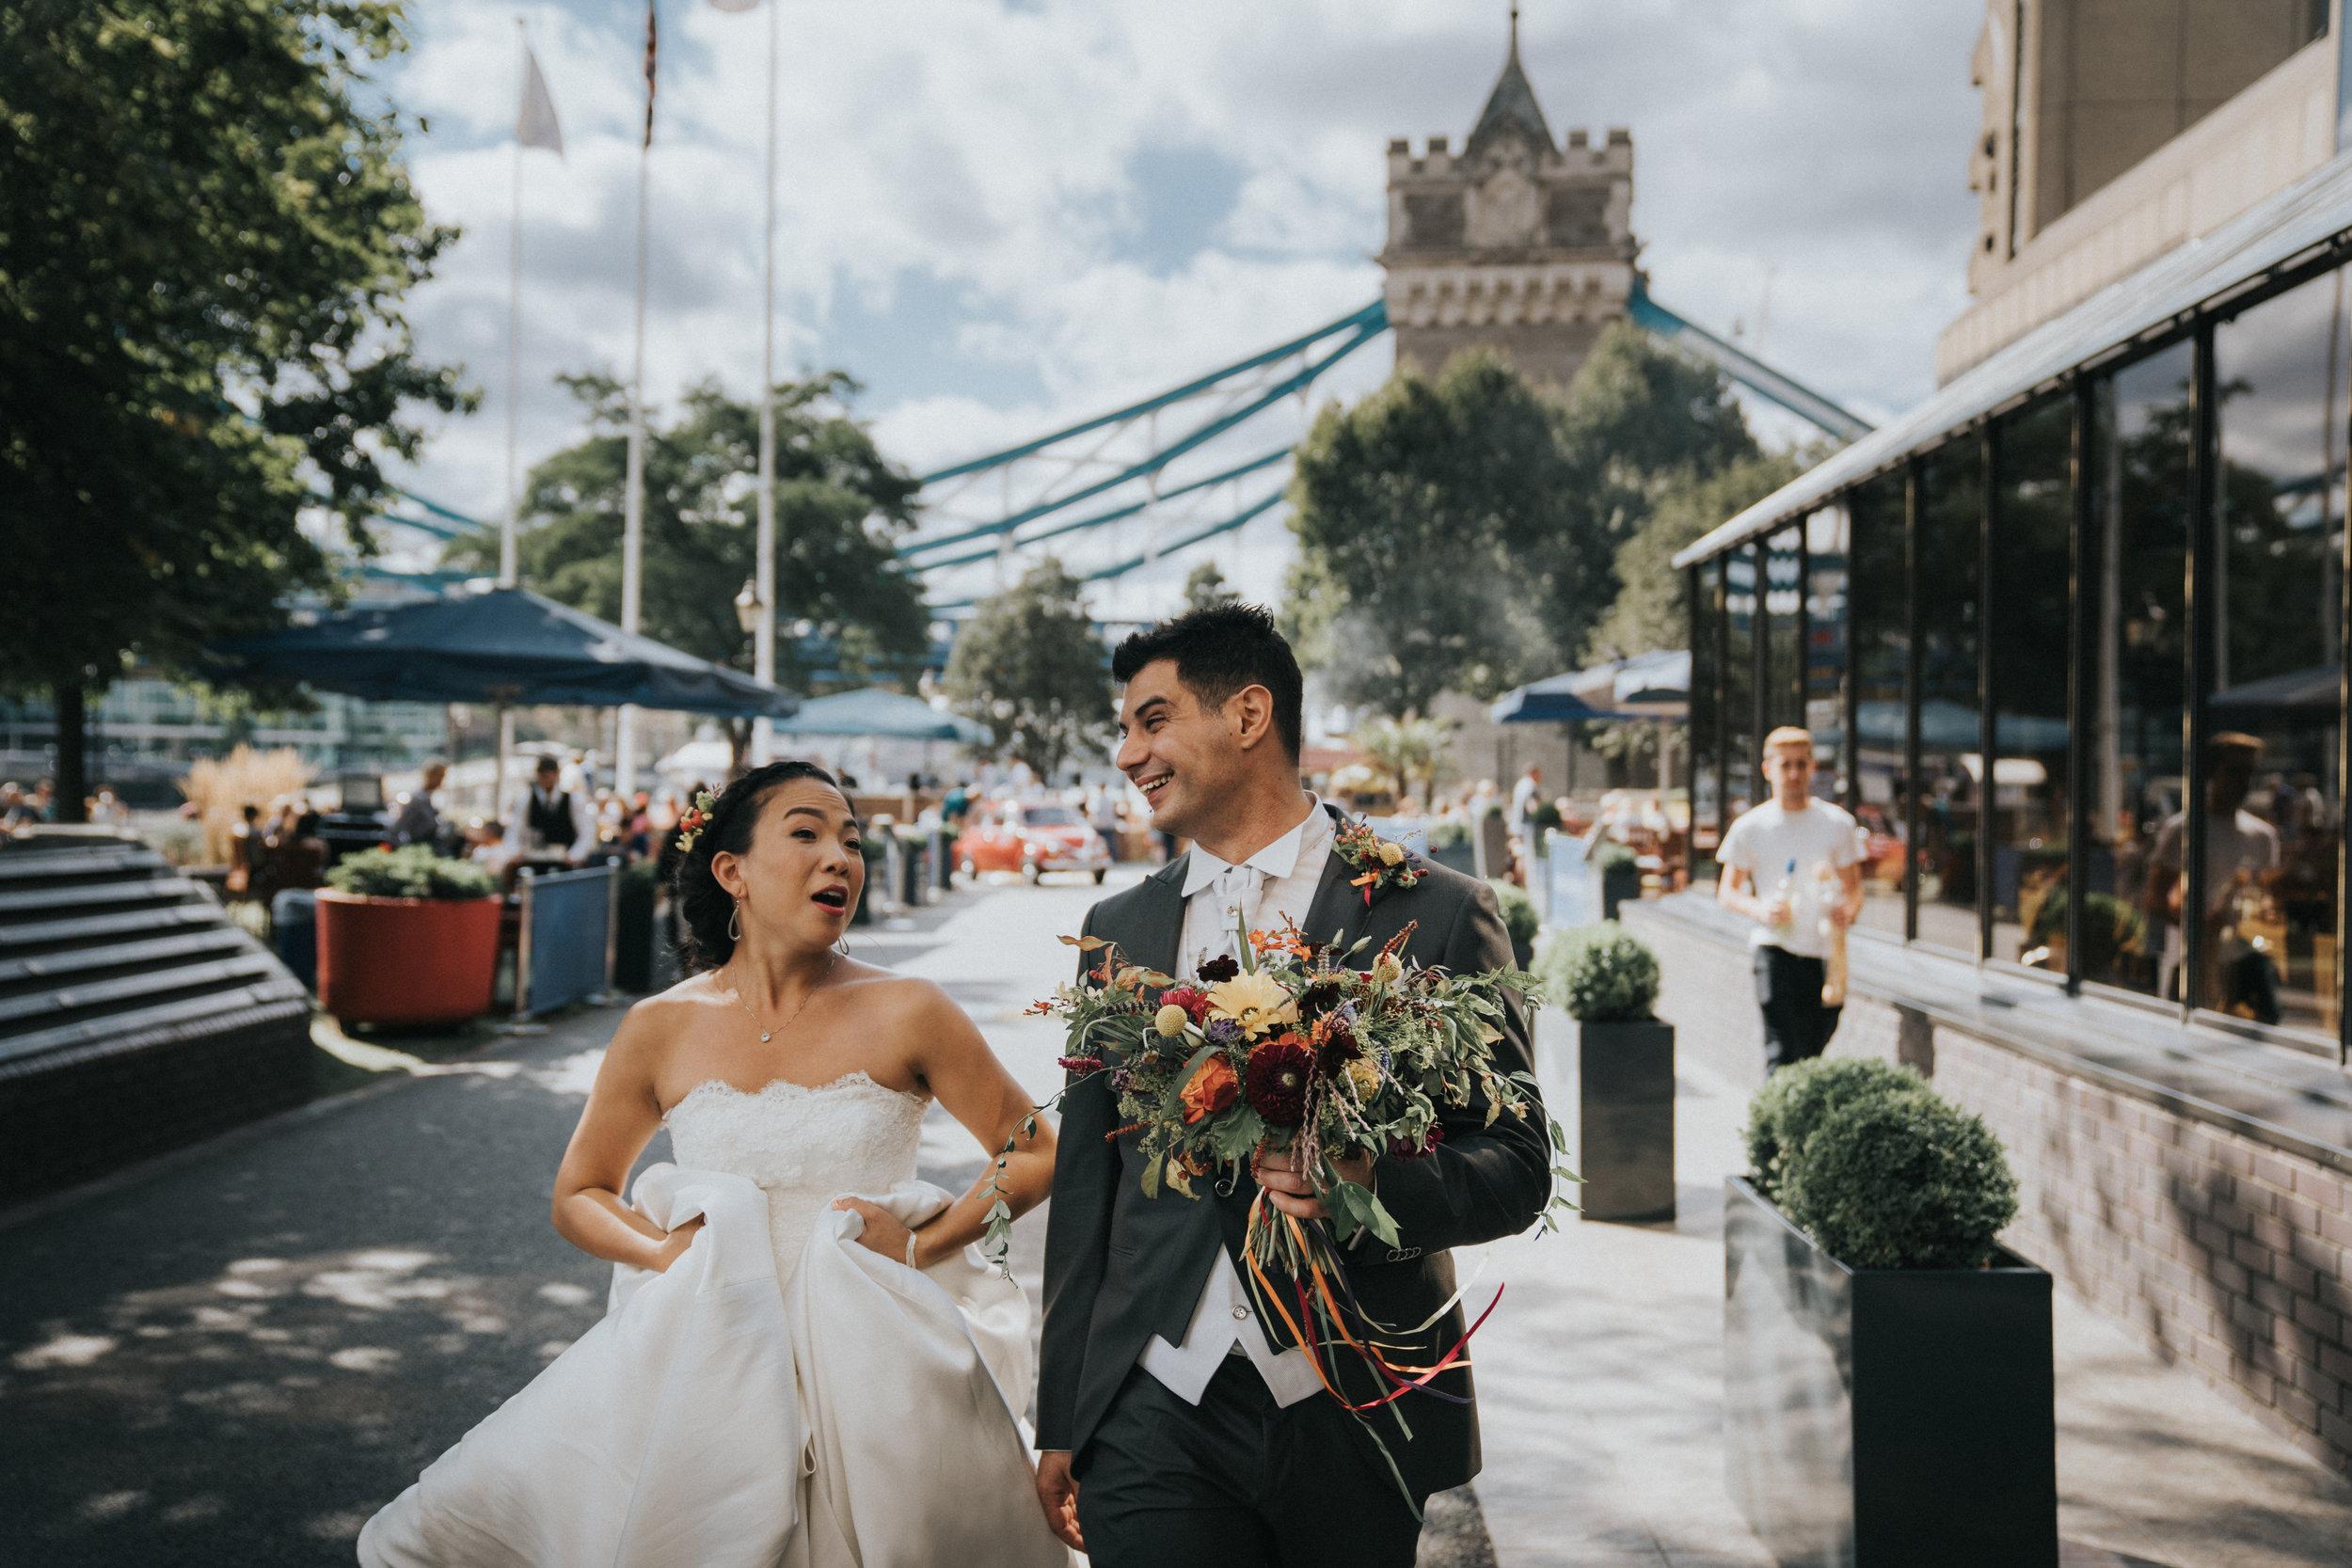 river-rooms-tower-bridge-london-stpauls-mondrian-hotel-wedding-photography-videography-56